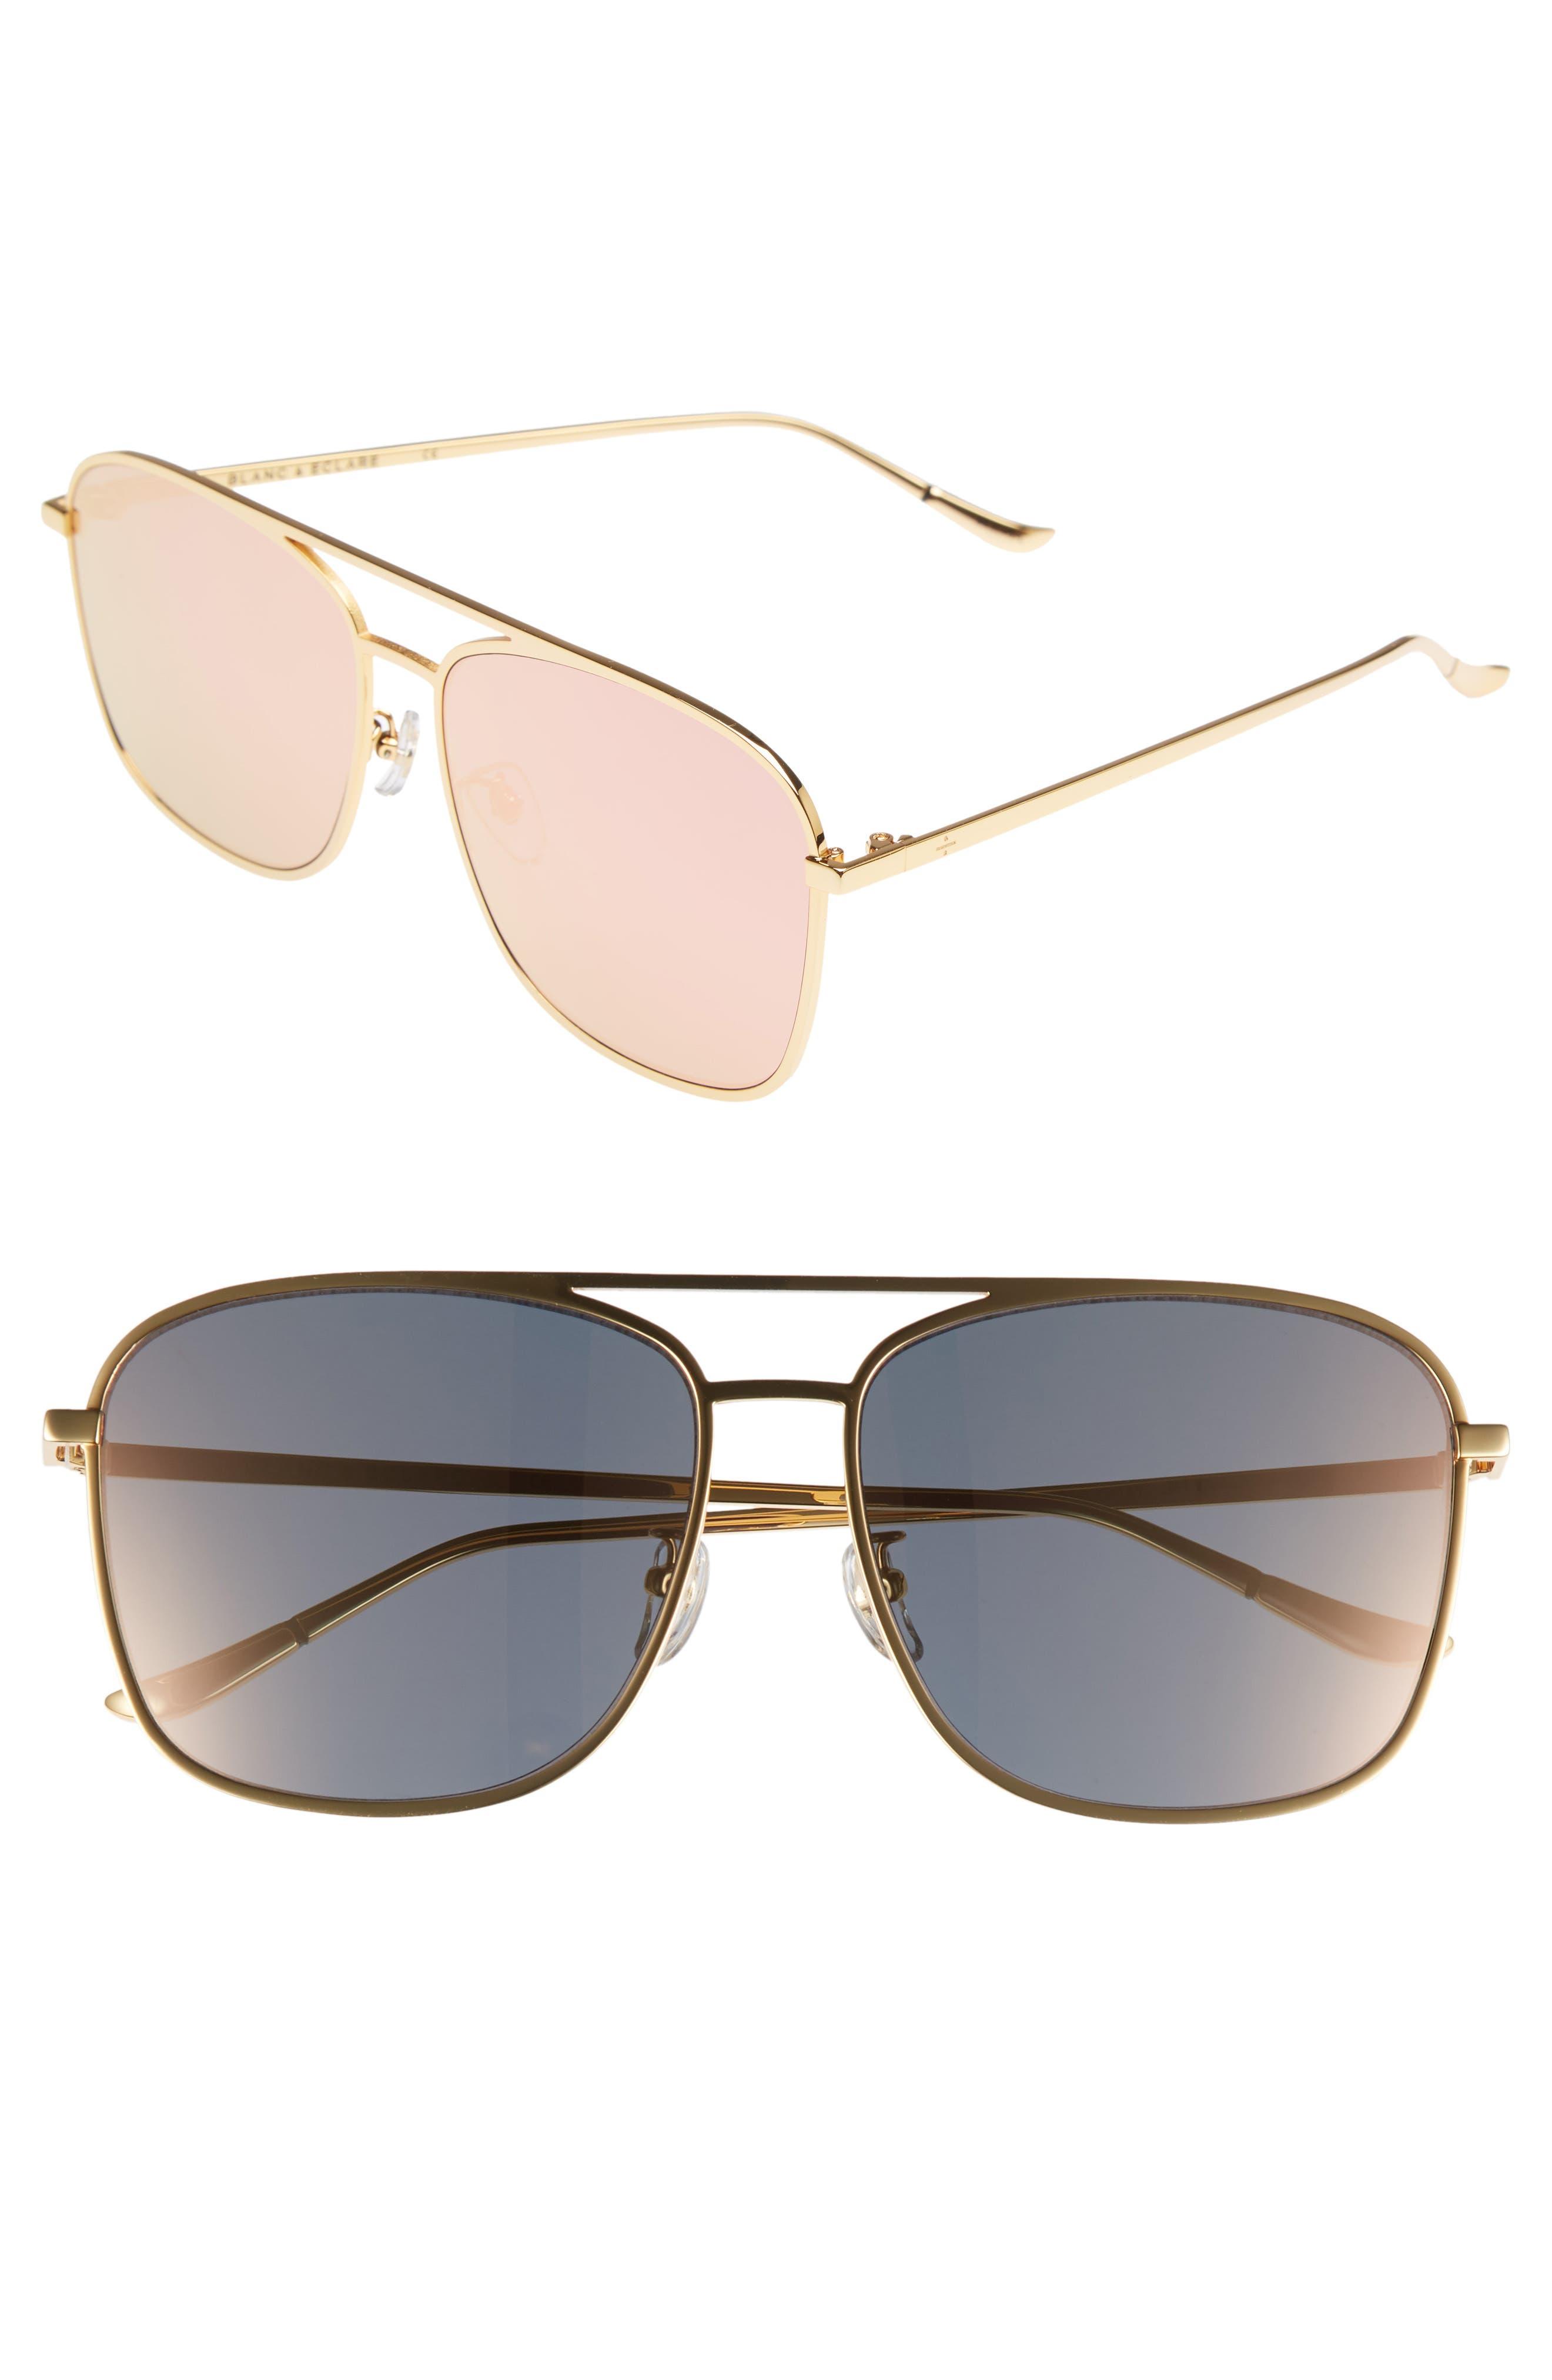 BLANC & ECLARE Geneva 61mm Large Polarized Metal Aviator Sunglasses,                         Main,                         color, Gold/ Pink